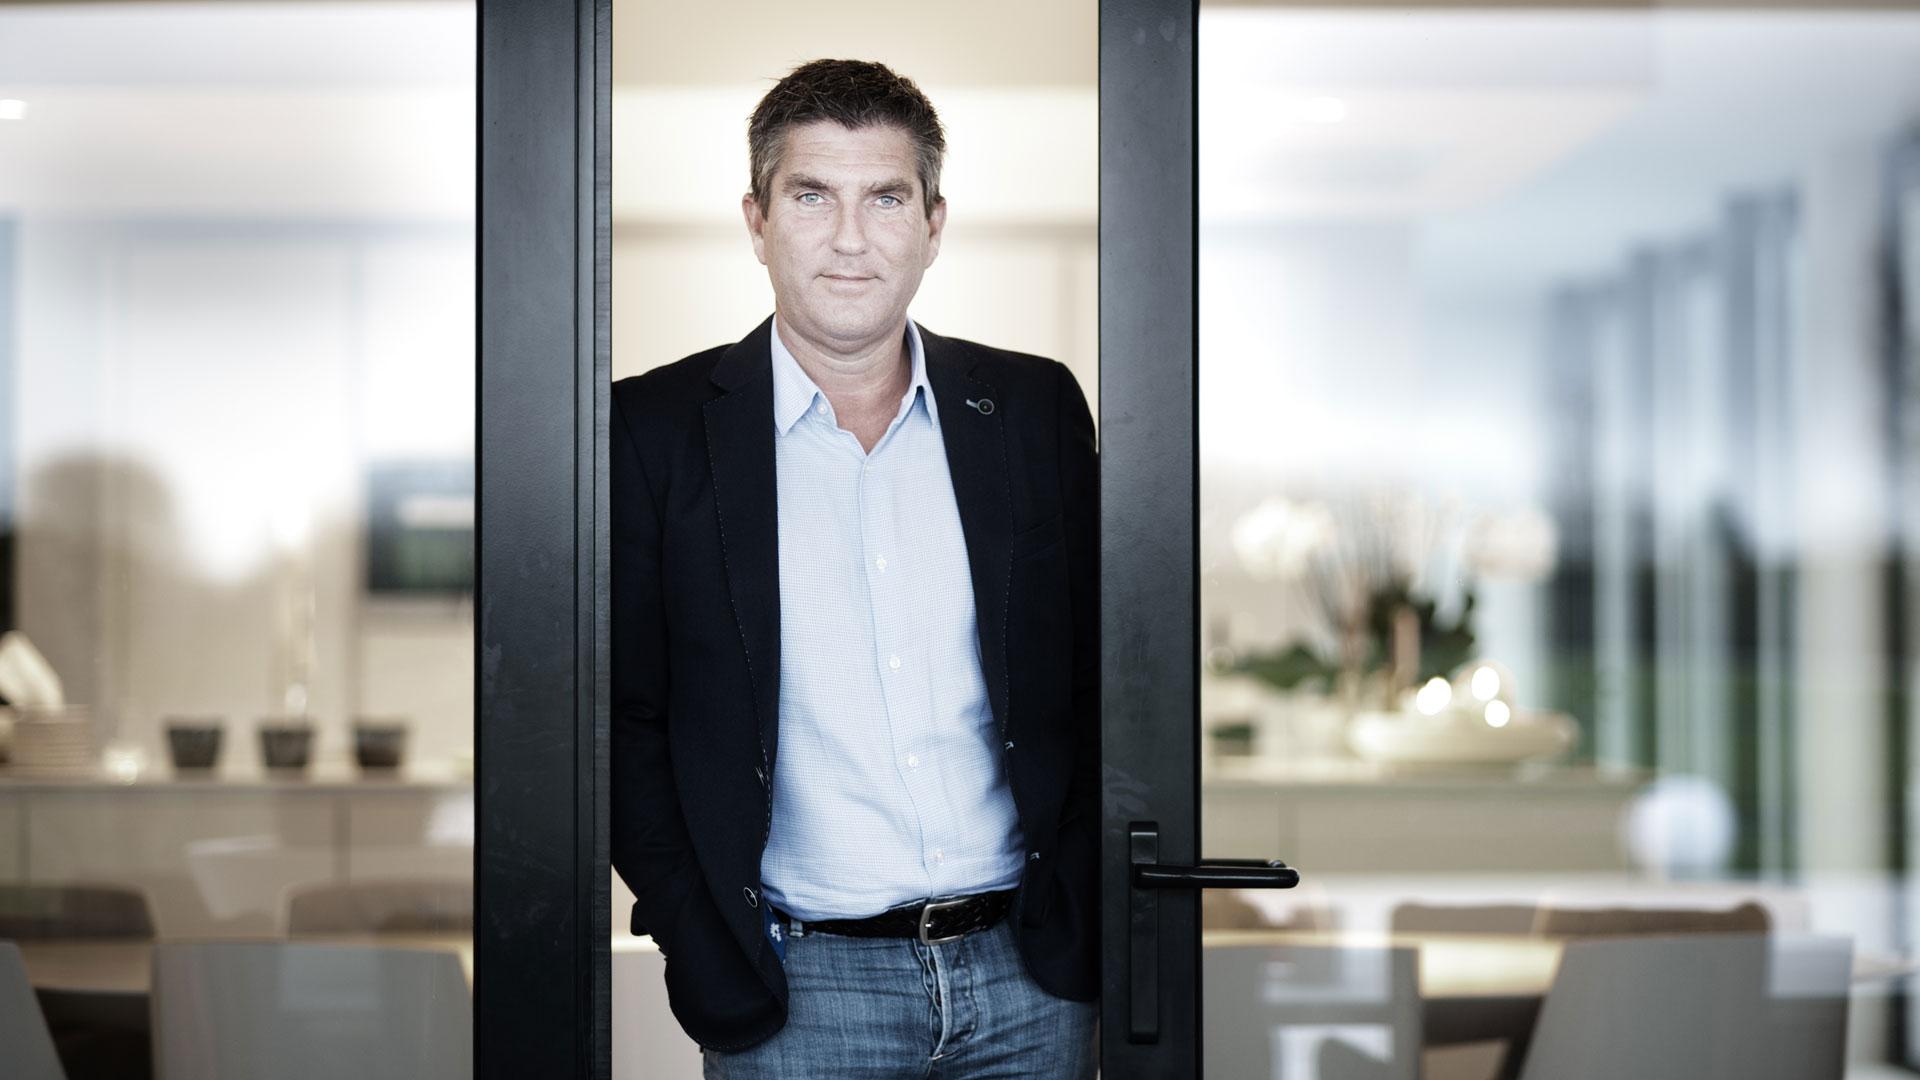 Inteview Patrick De Koster, manager van Kevin De Bruyne (deel 1)